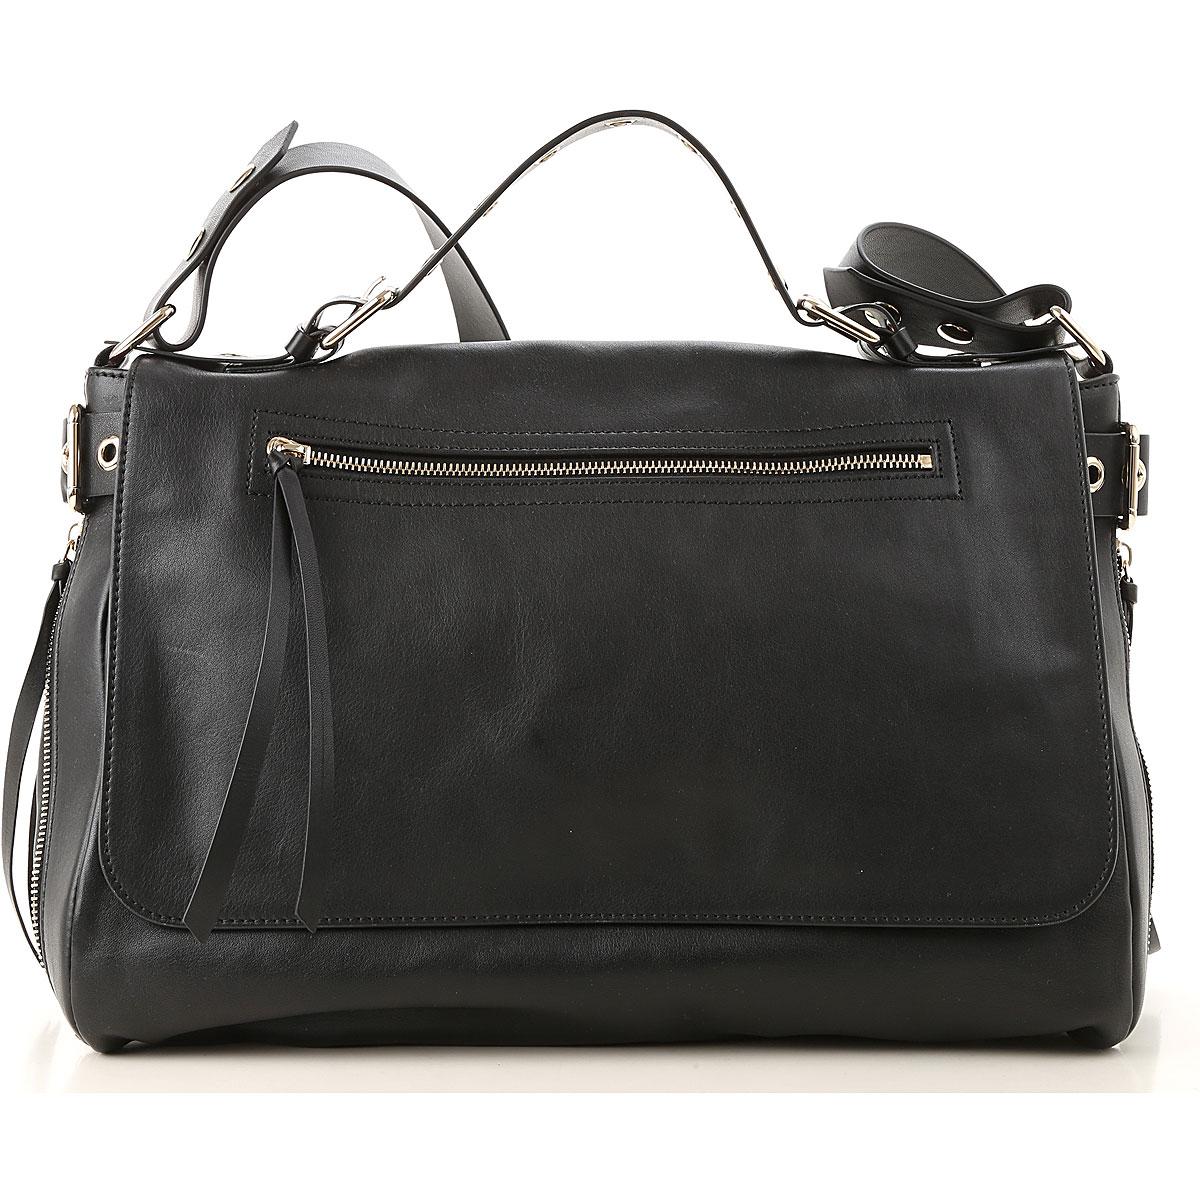 Valentino Top Handle Handbag, Red Valentino, Black, Leather, 2017 USA-474630